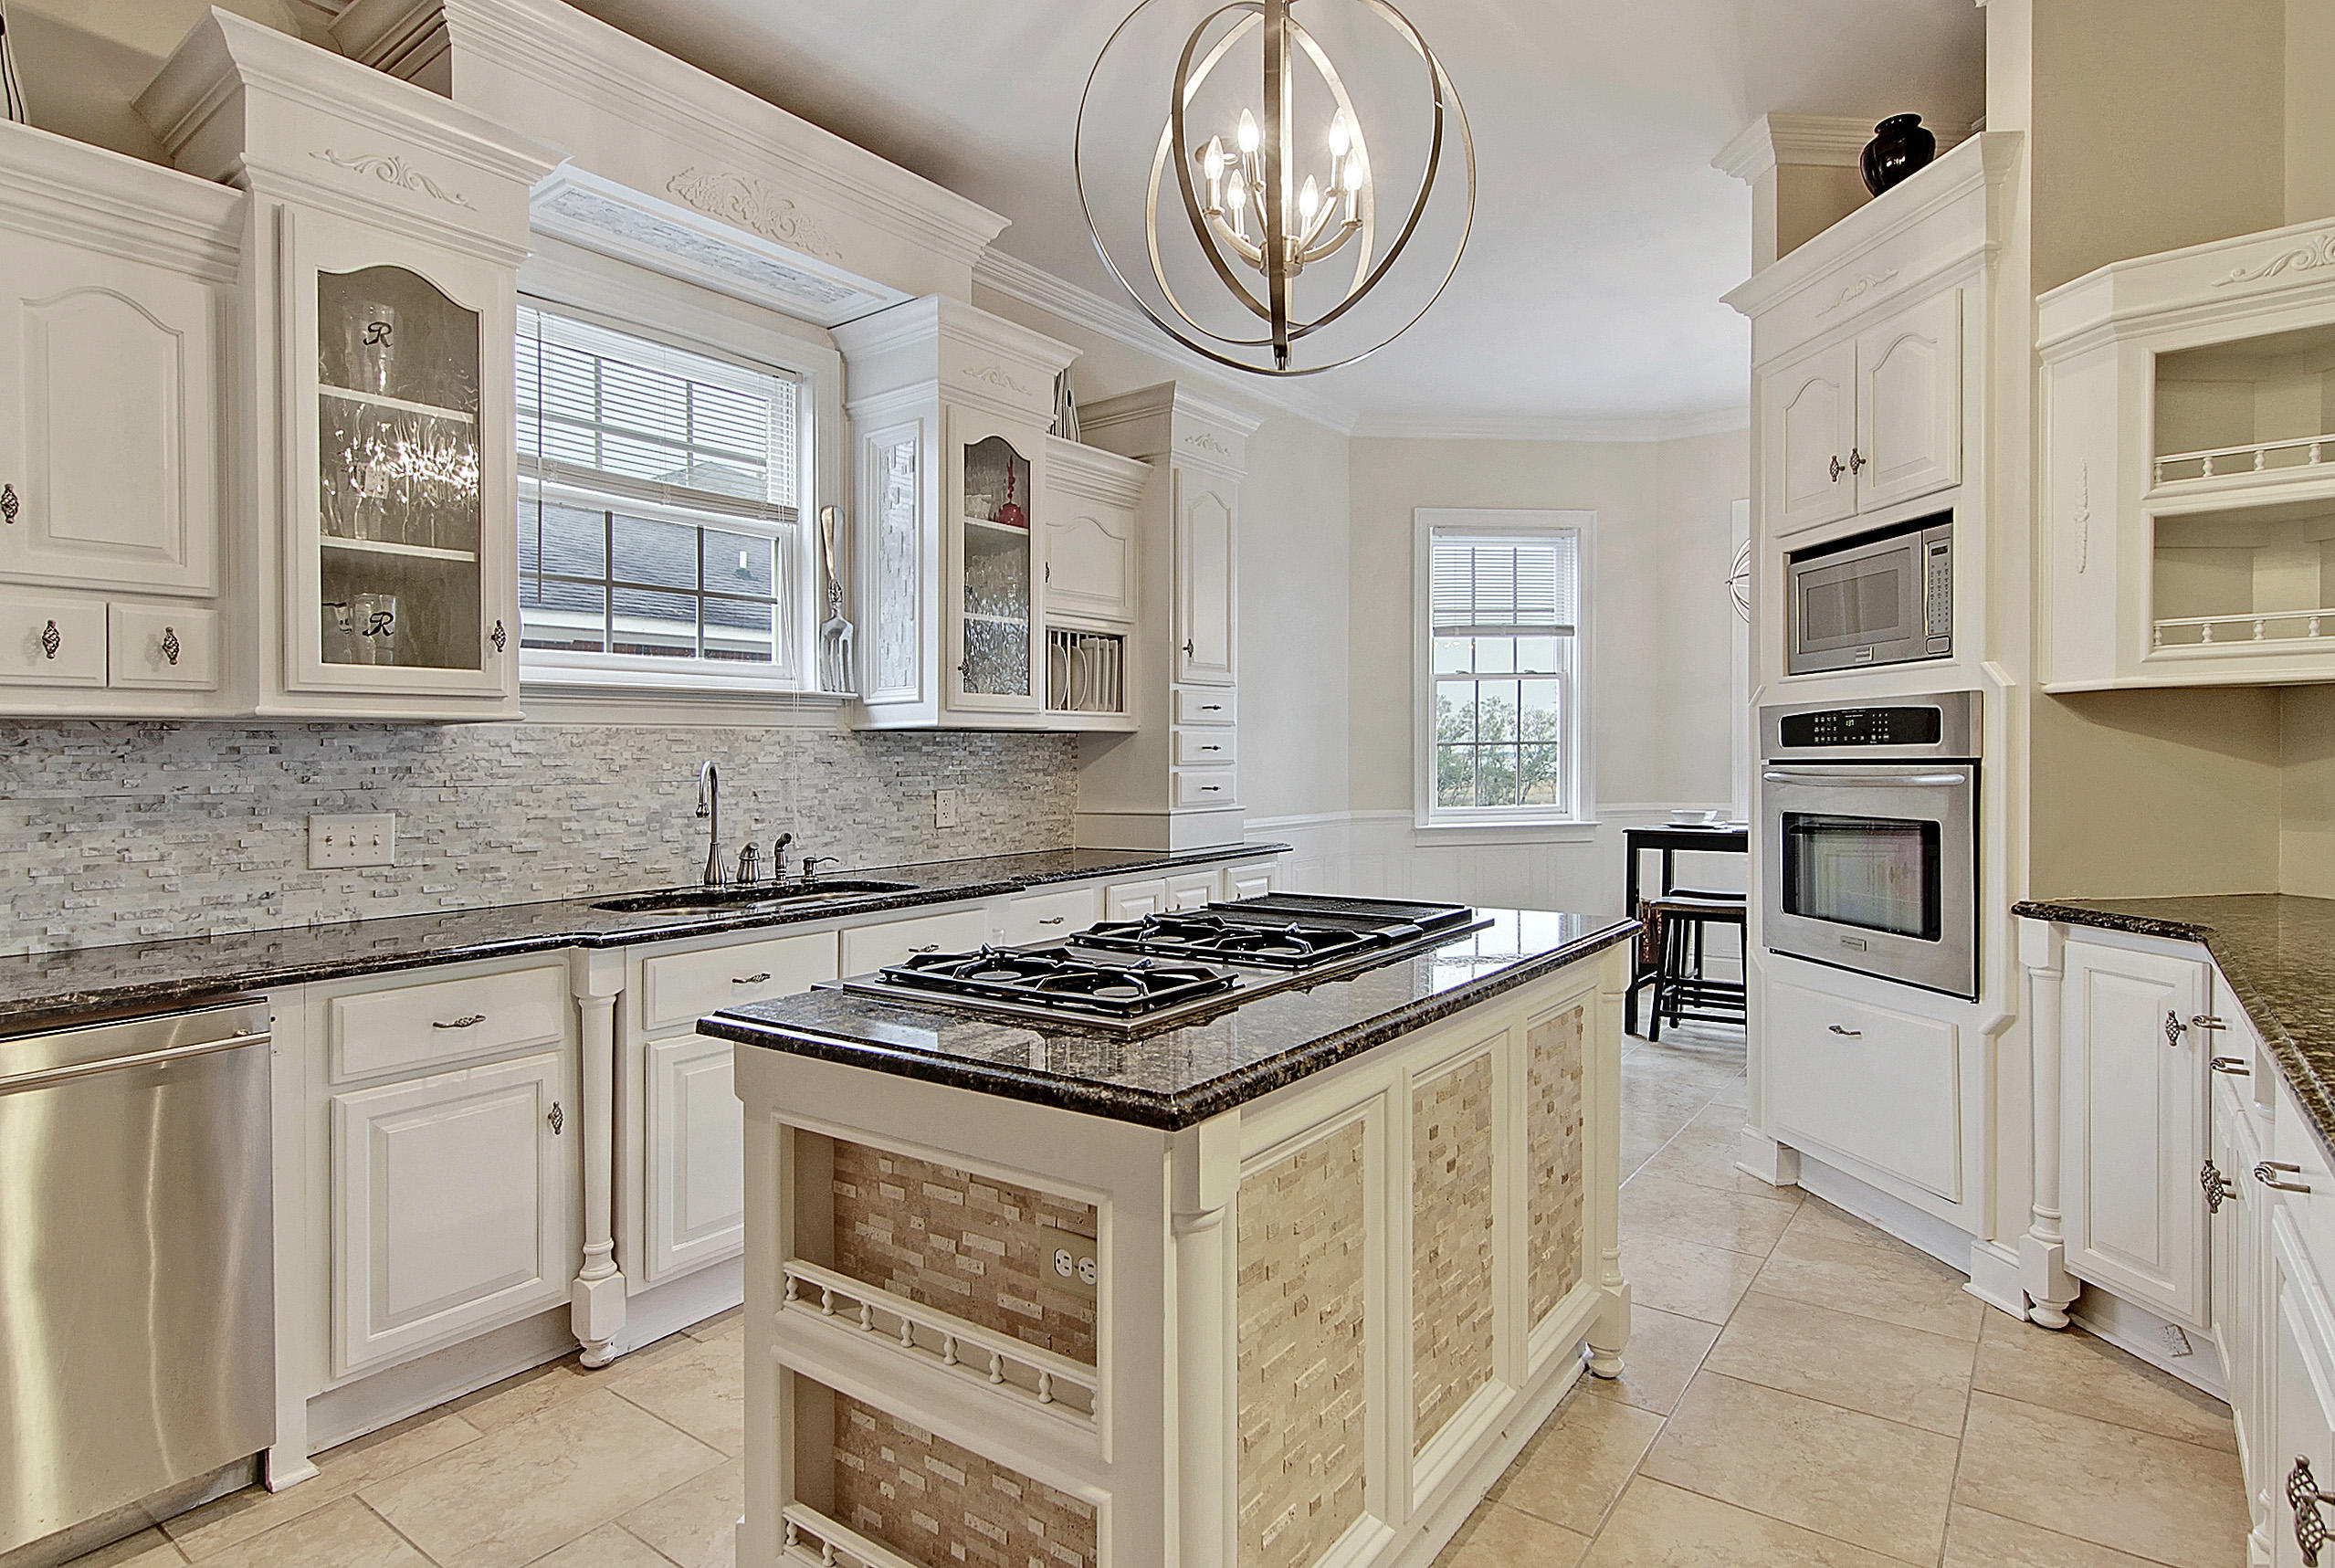 Hamlin Beach Homes For Sale - 2797 Hamlin Beach, Mount Pleasant, SC - 22